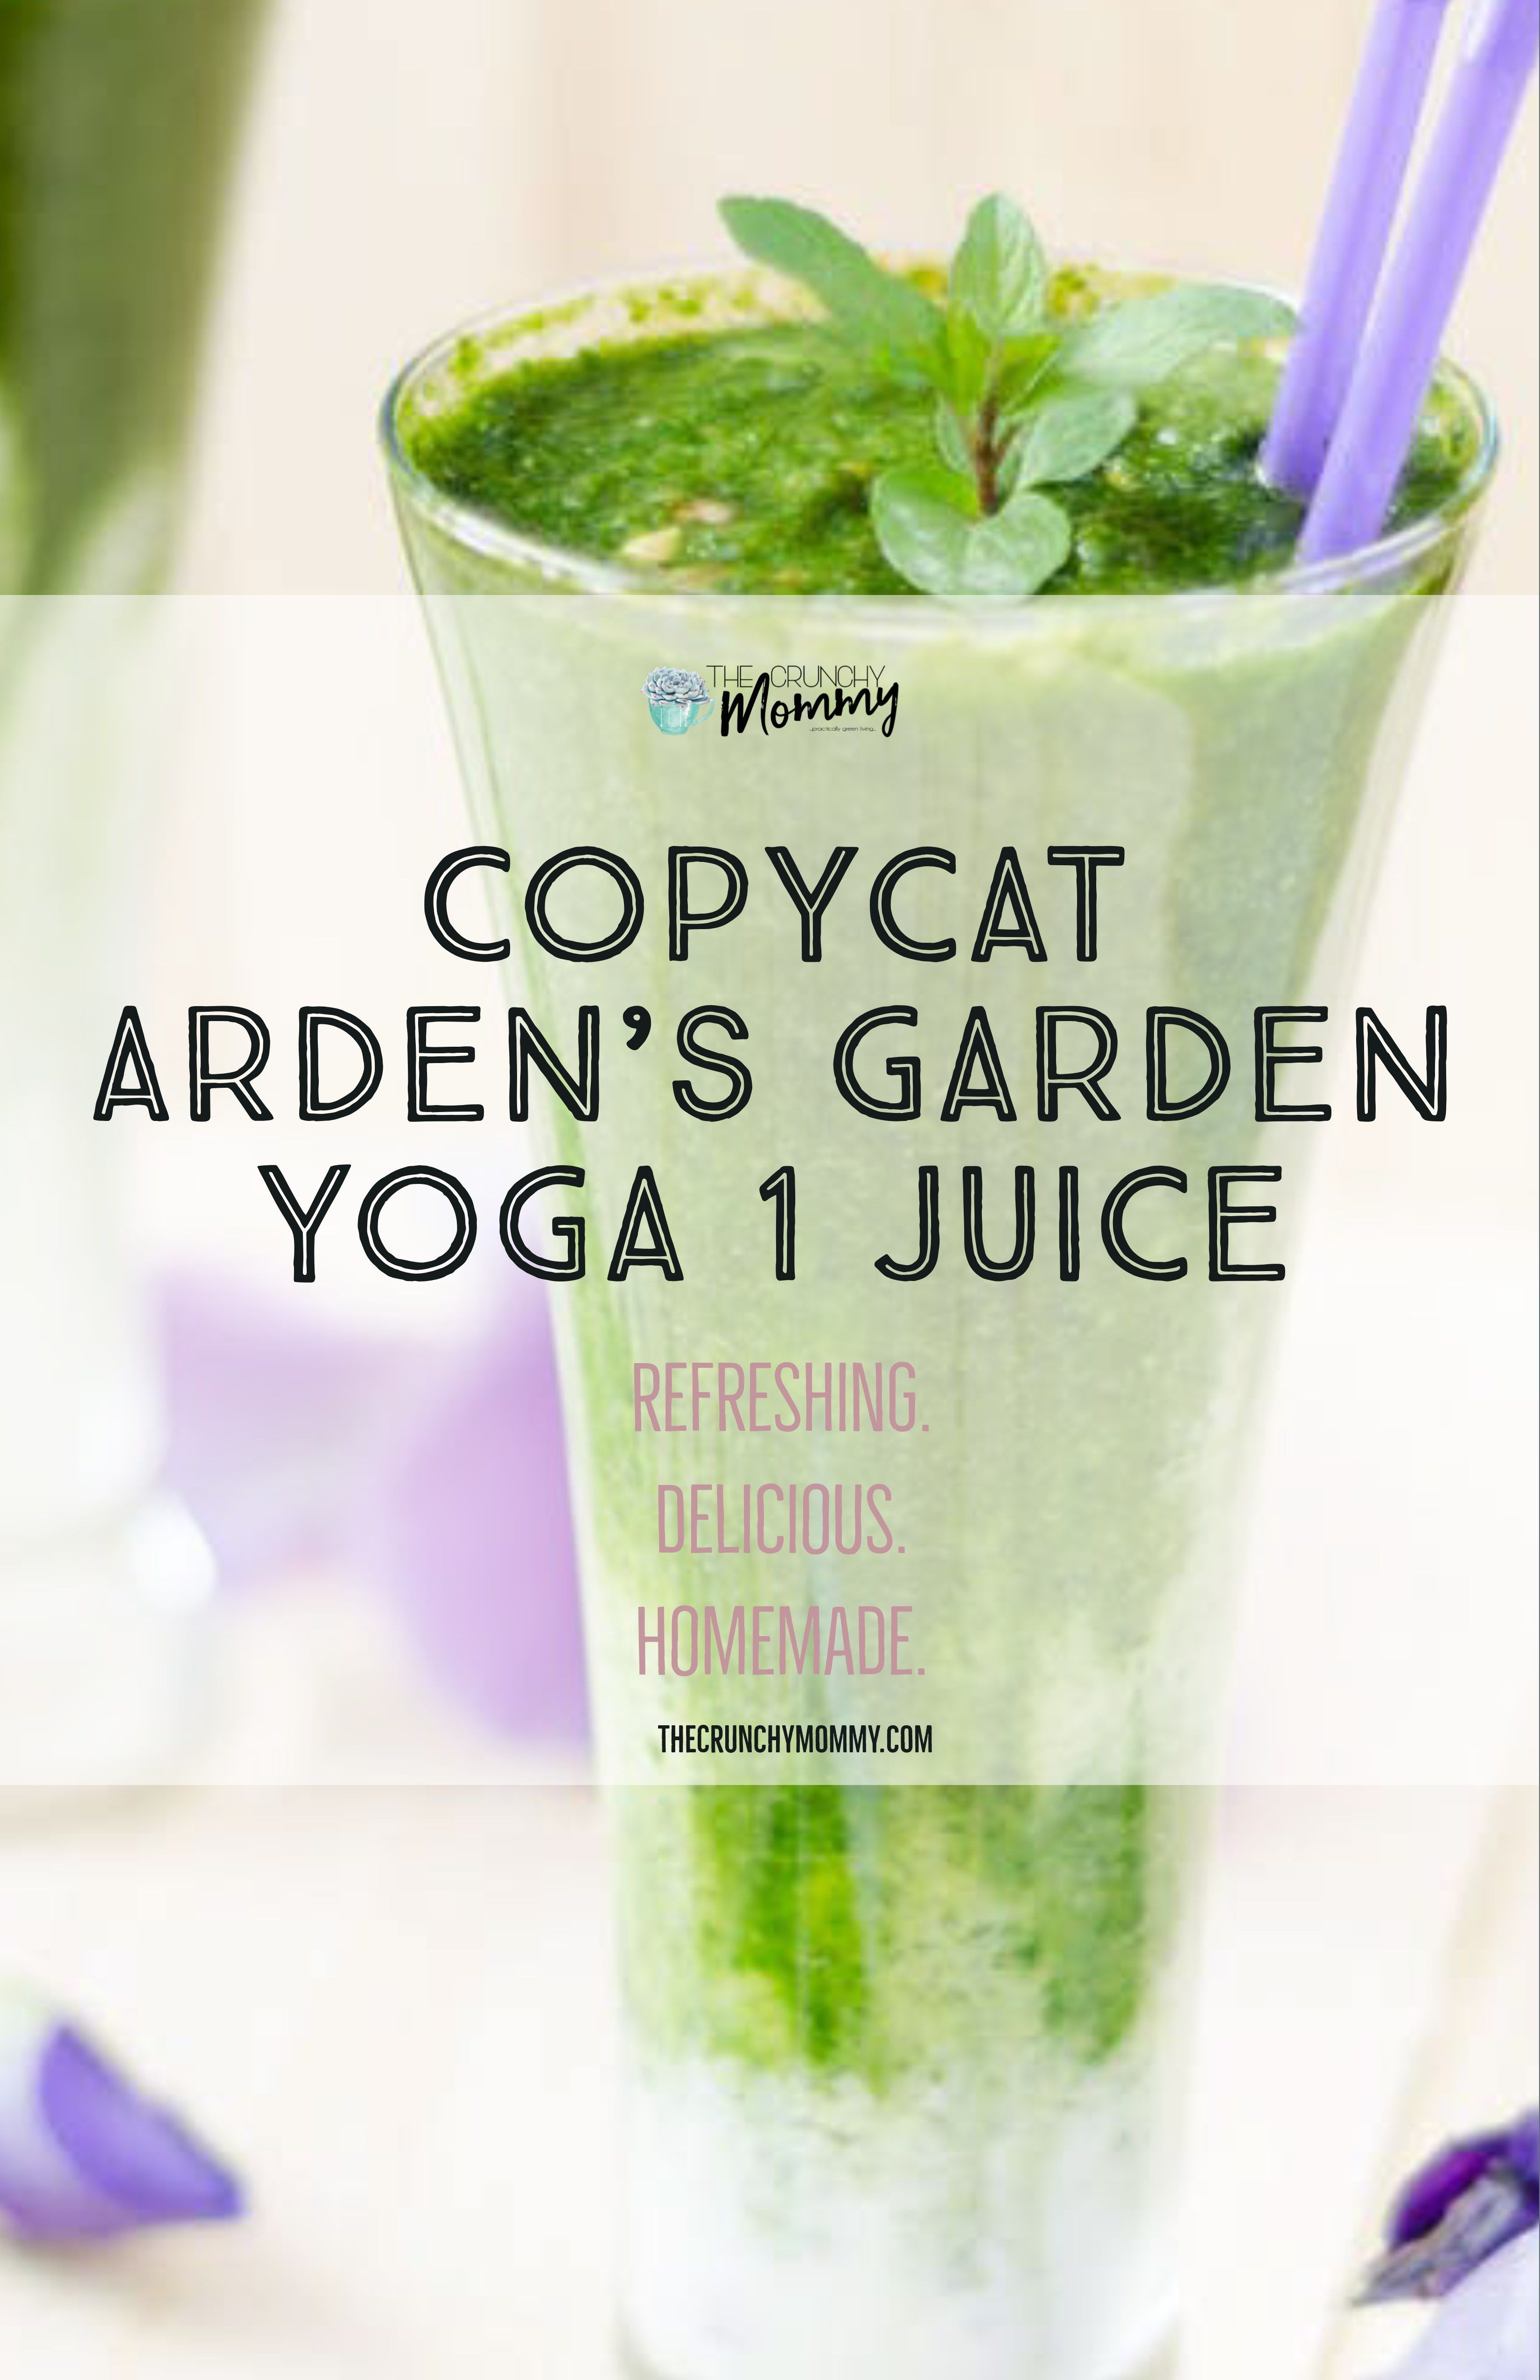 Copycat Arden S Garden Yoga 1 Recipe The Crunchy Mommy Recipe Nutribullet Smoothie Recipes Detox Recipes Arden Garden